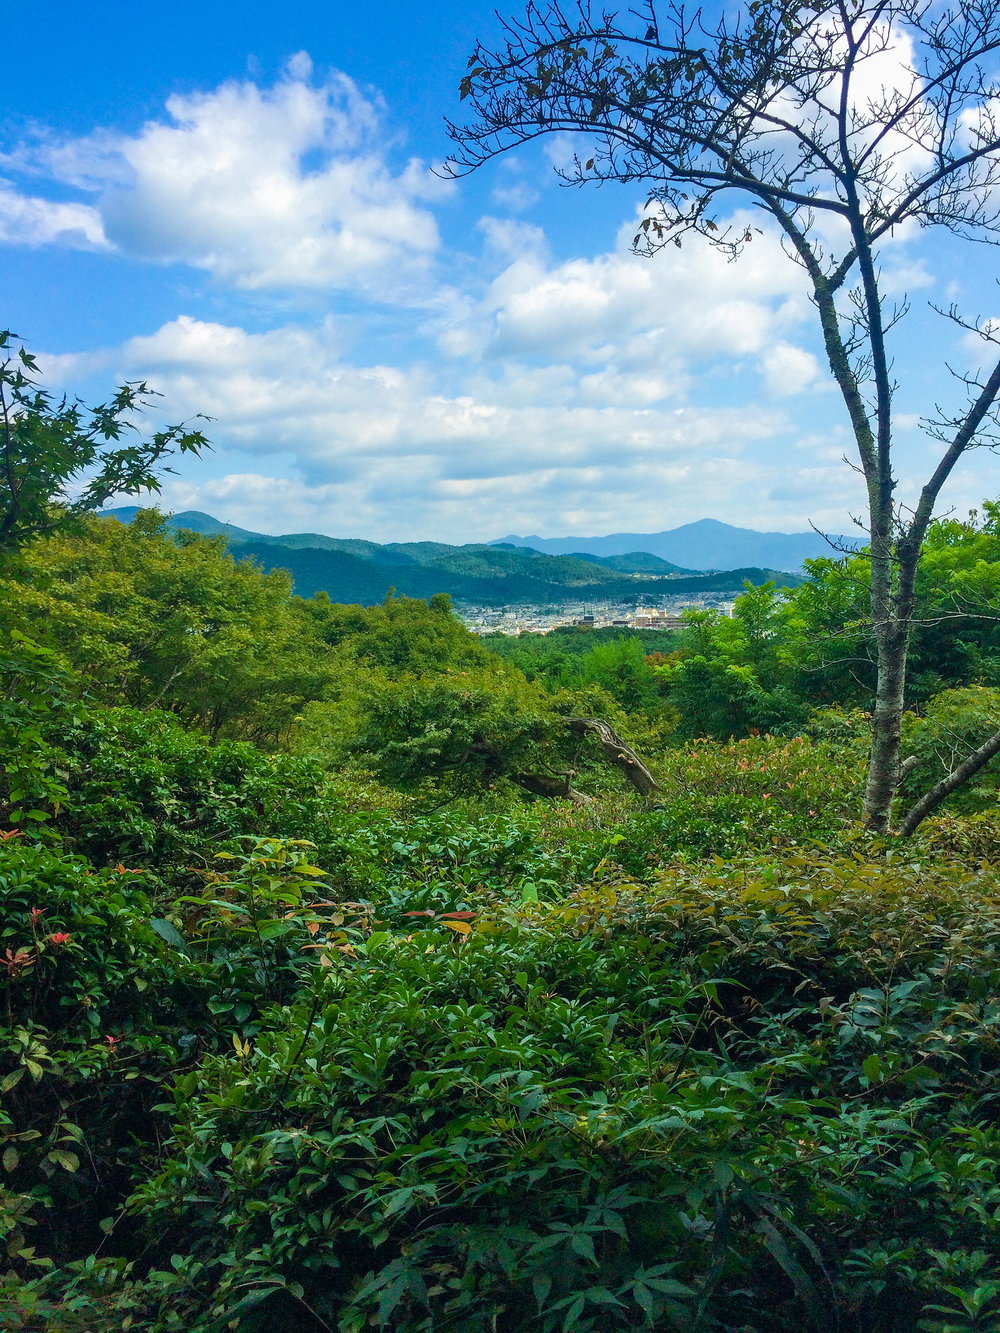 30064783710_248bb26c2d_k.jpgGuide to Visiting Kyoto's Okochi Sanso, Arashiyama's Stunning Traditional Japanese Villa and Zen Garden